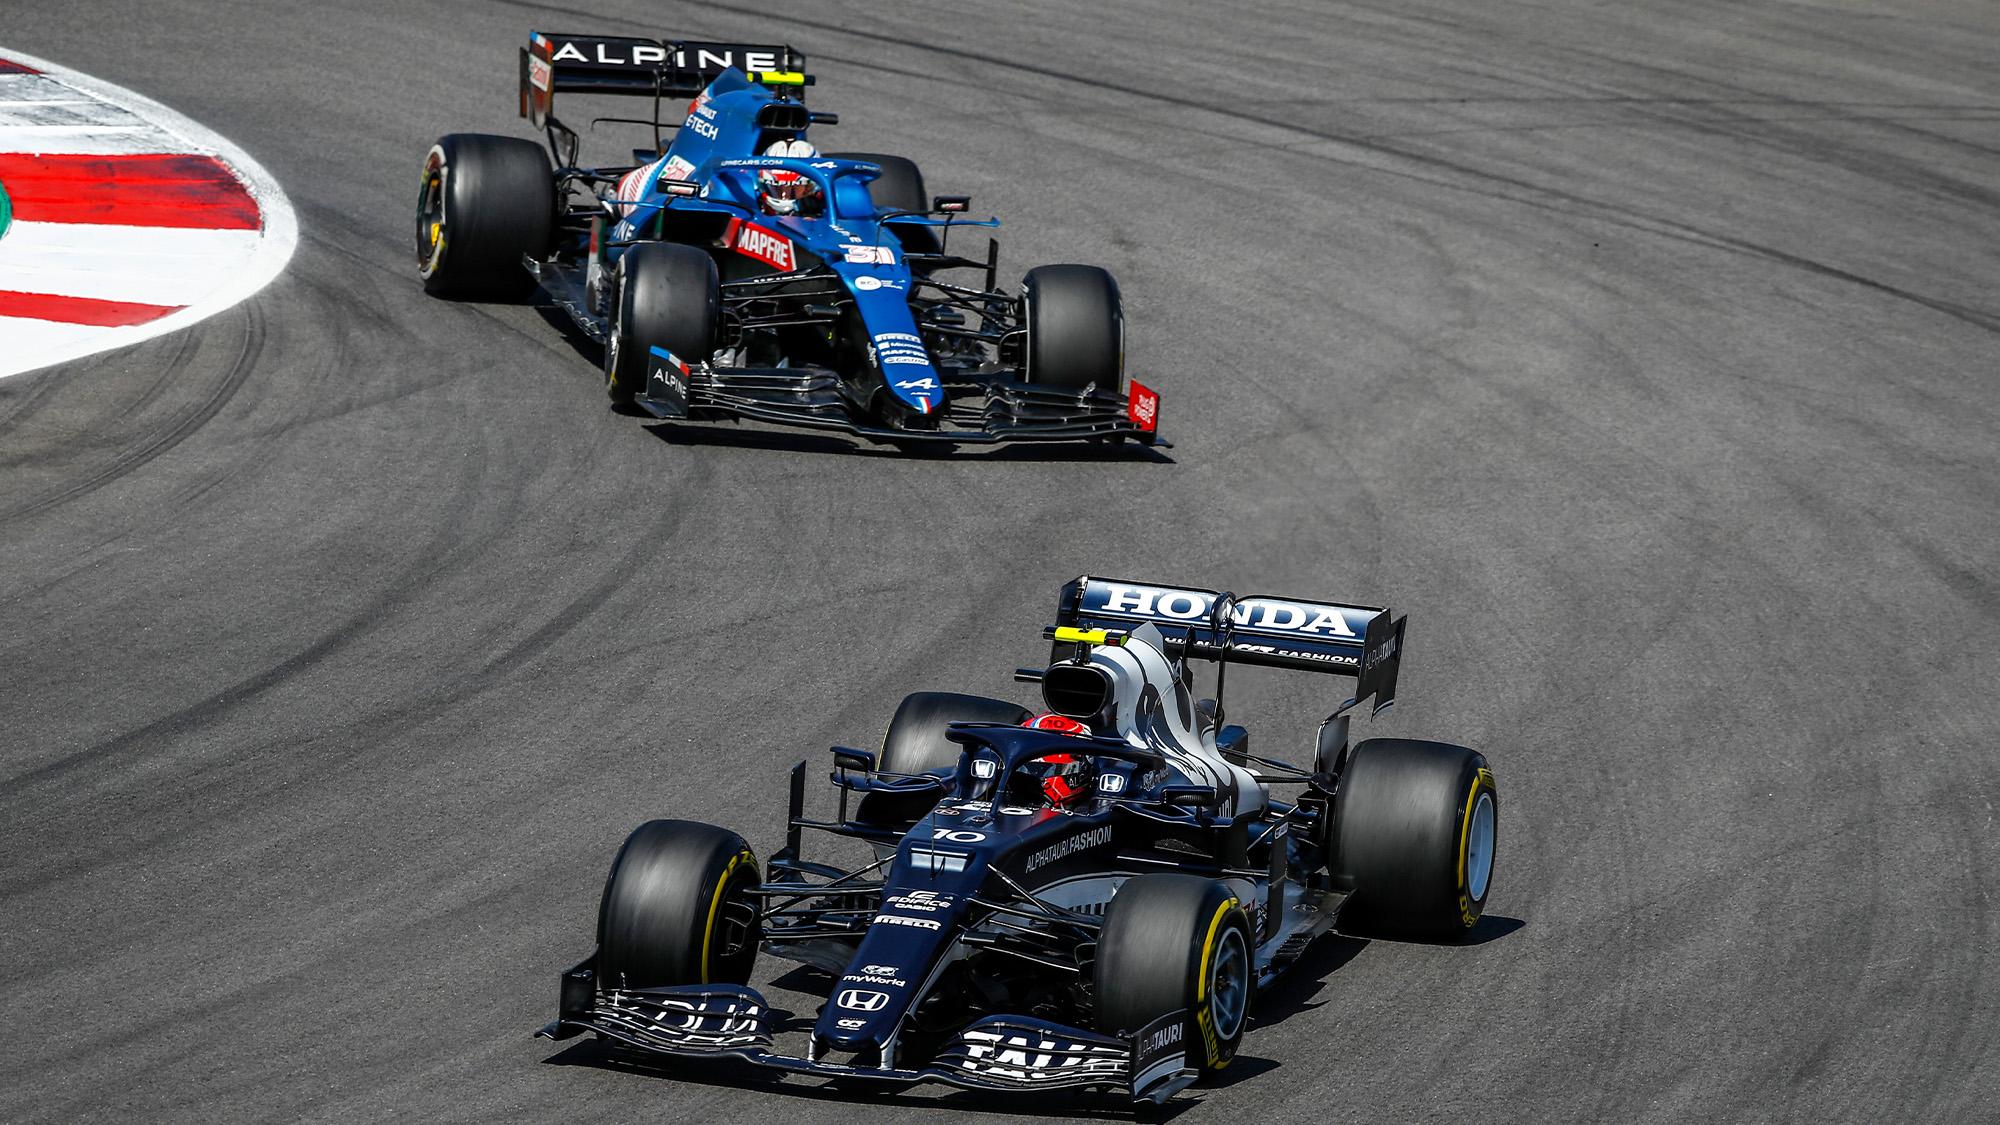 Esteban Ocon and Pierre Gasly on track